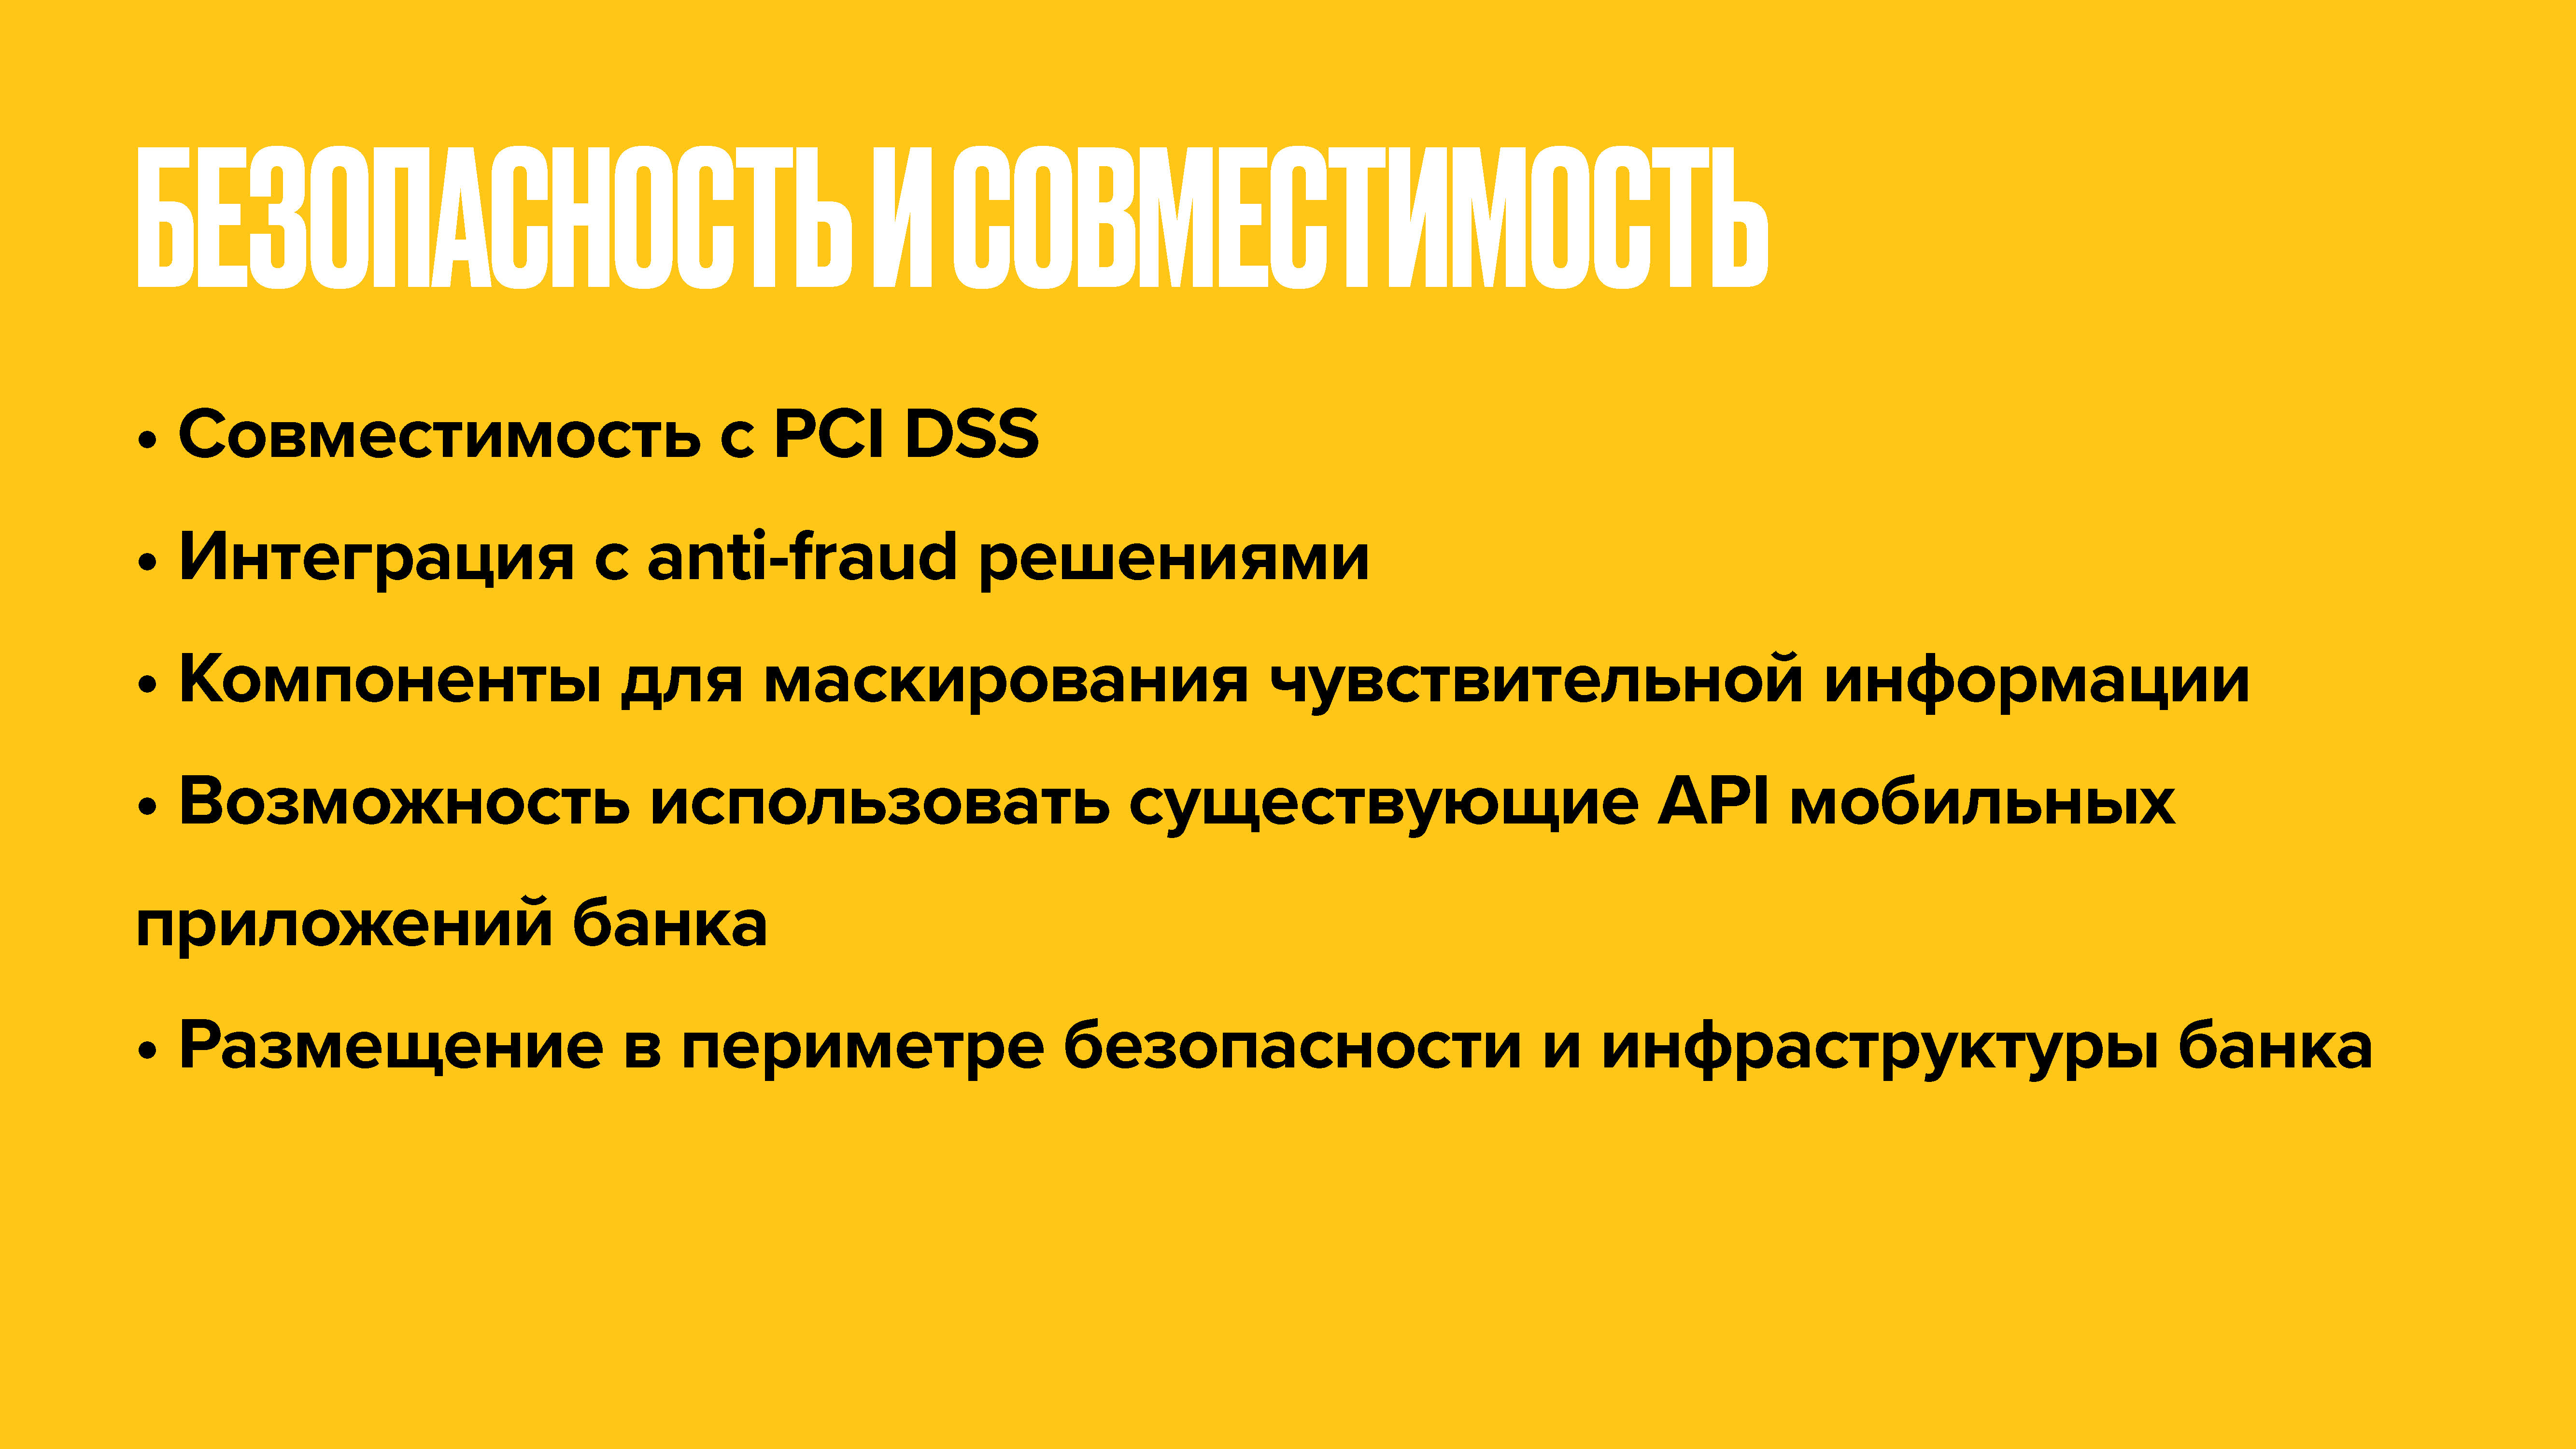 sabansky_Page_7